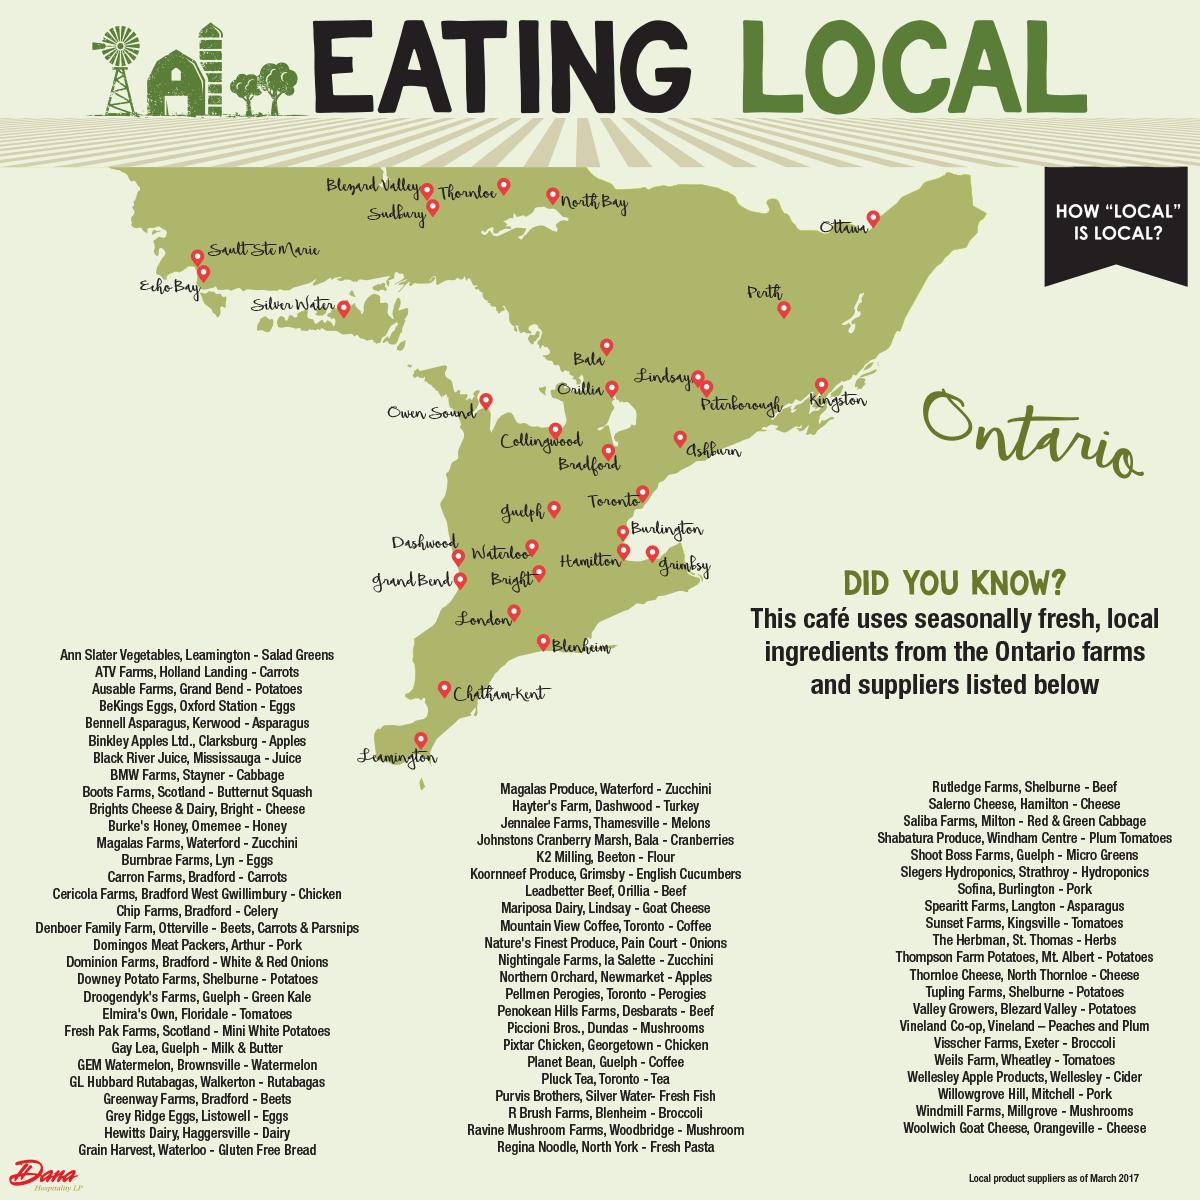 Ontario Local Supplier List